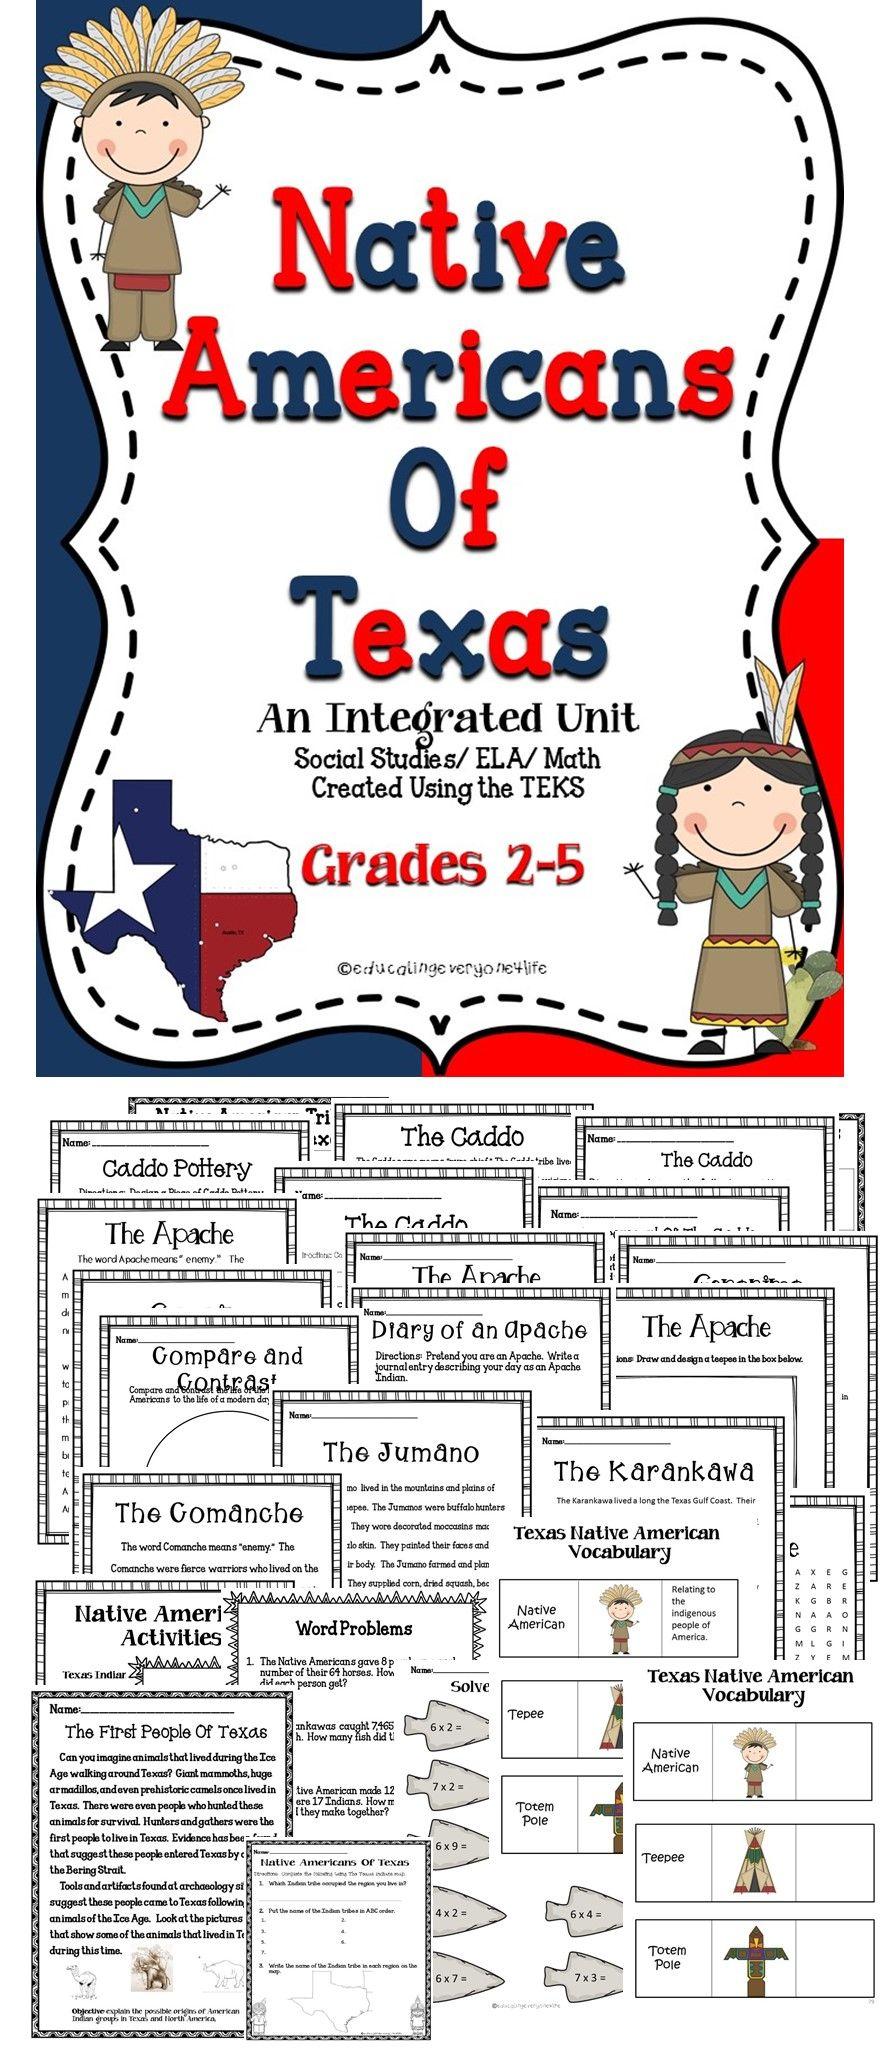 Native Americans of Texas 4th grade social studies